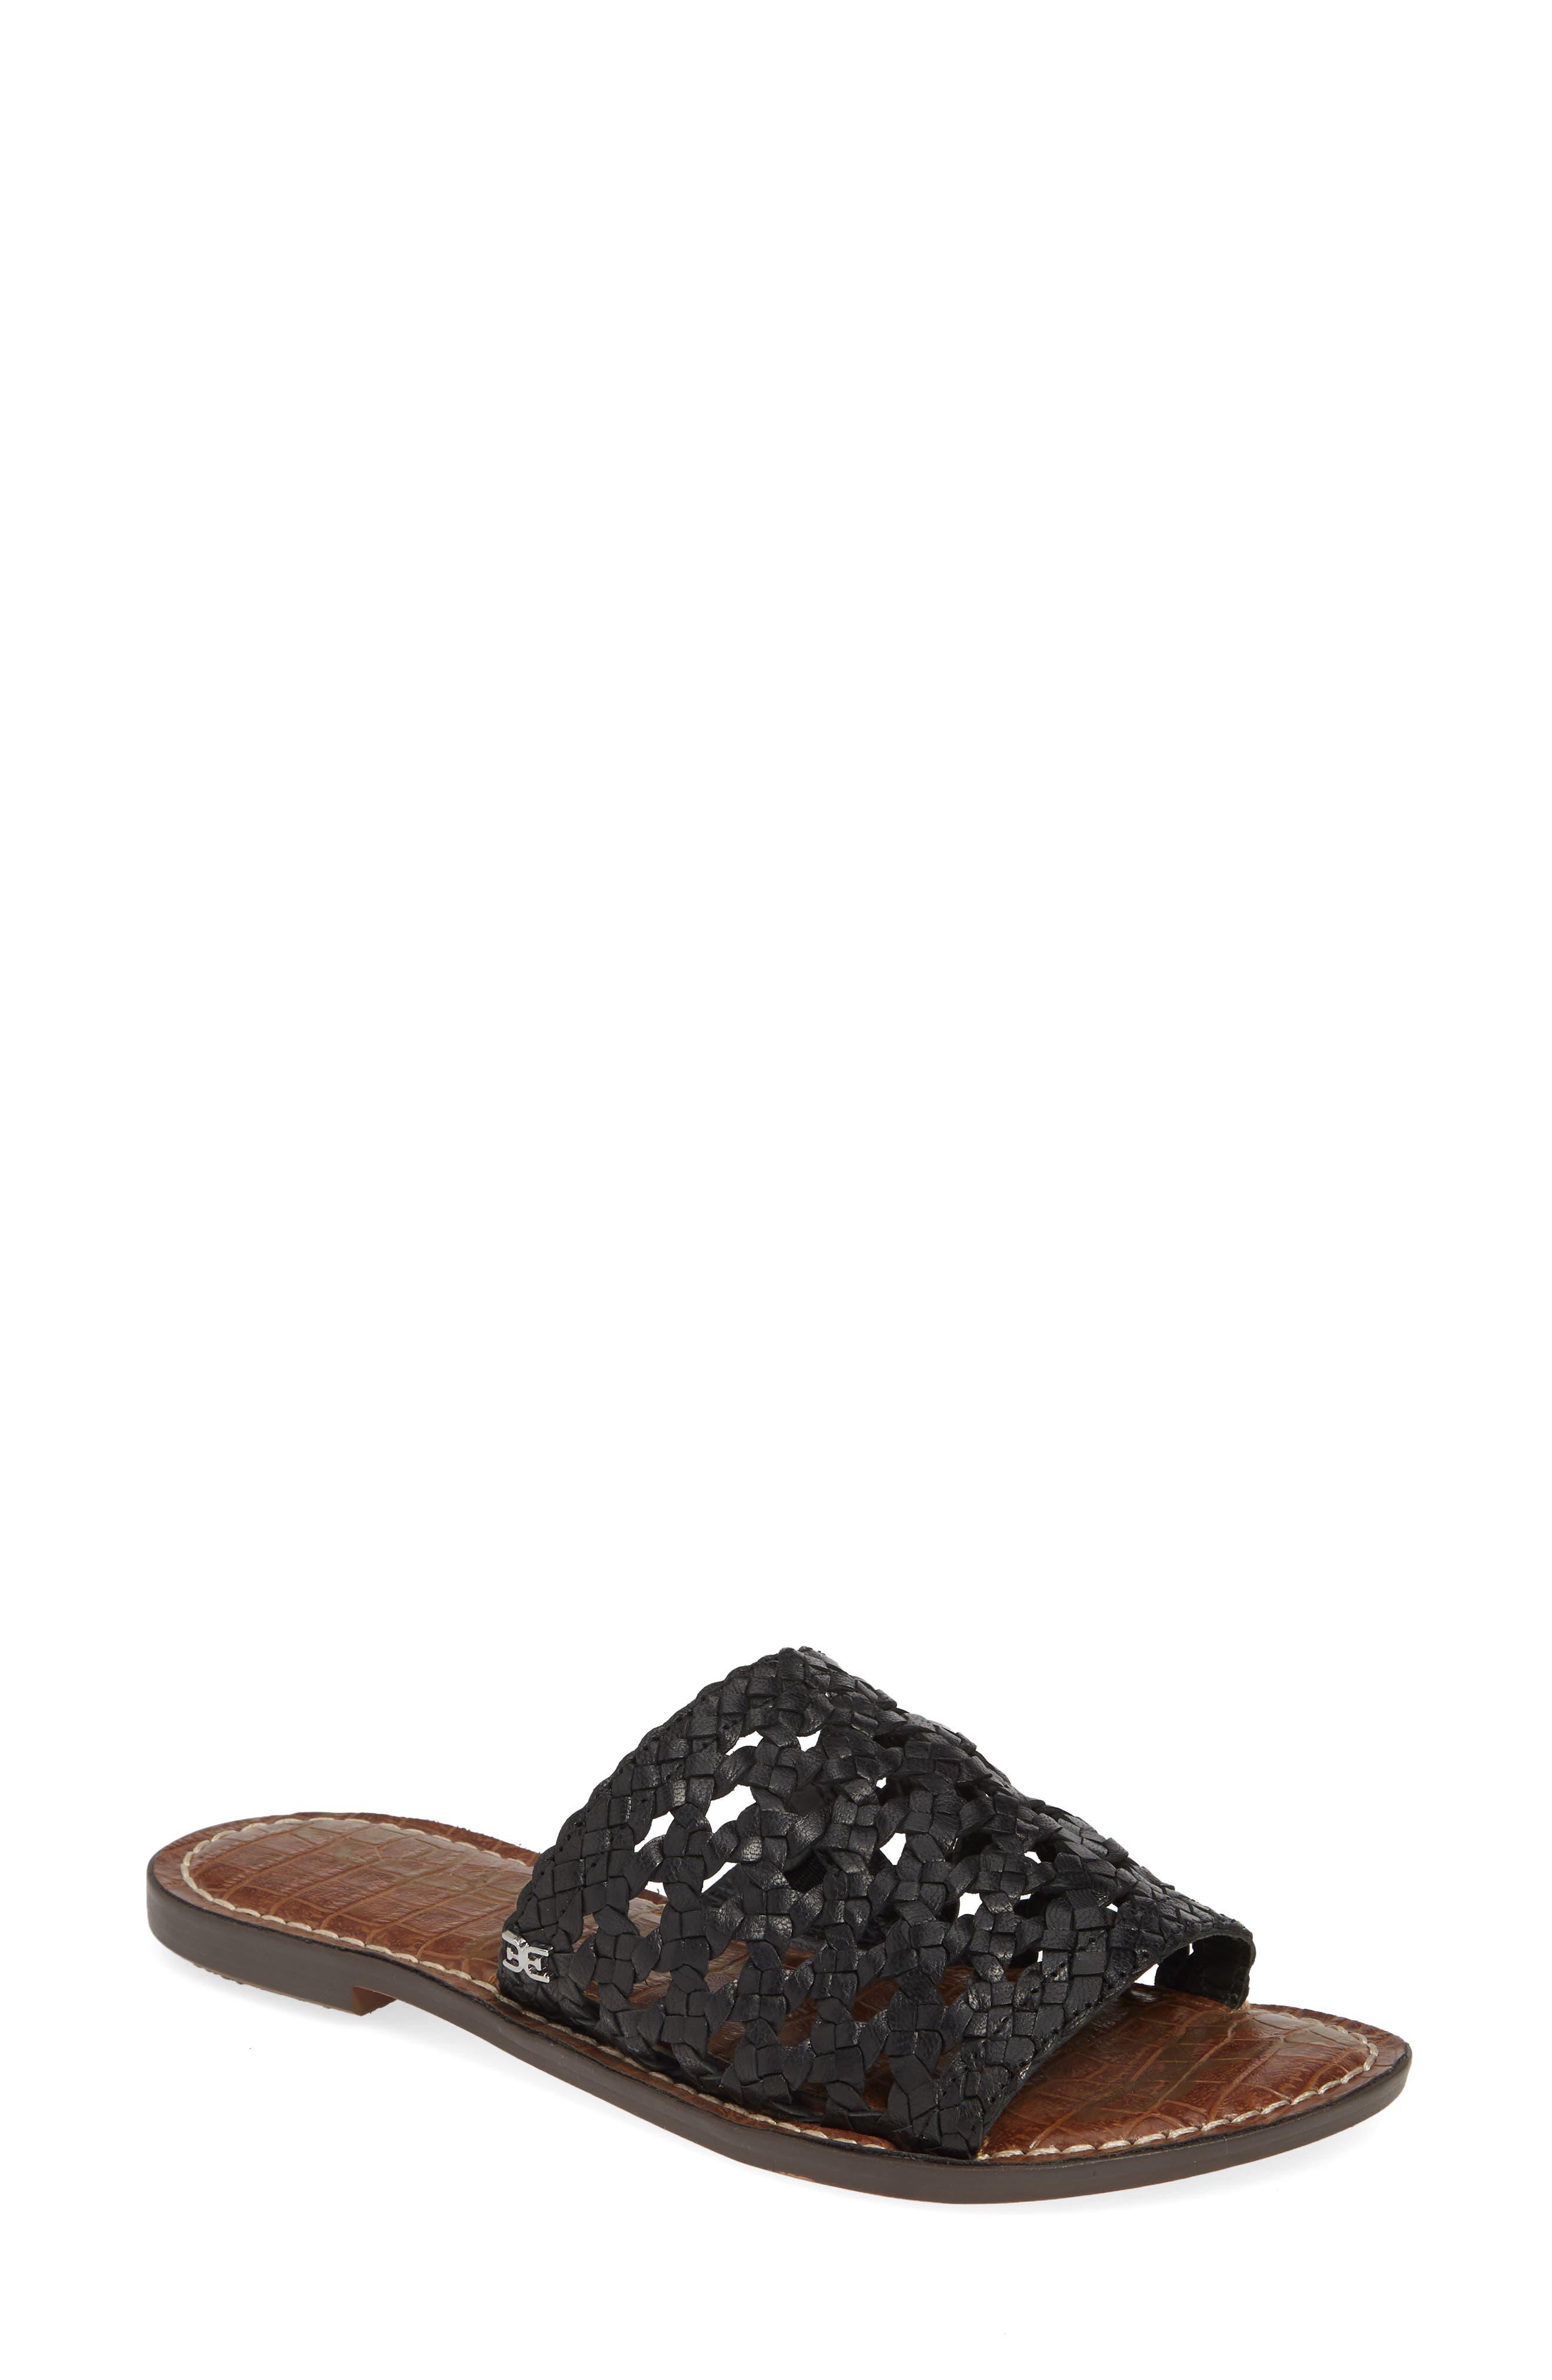 Sam Edelman Genovia Woven Slide Sandal, Black